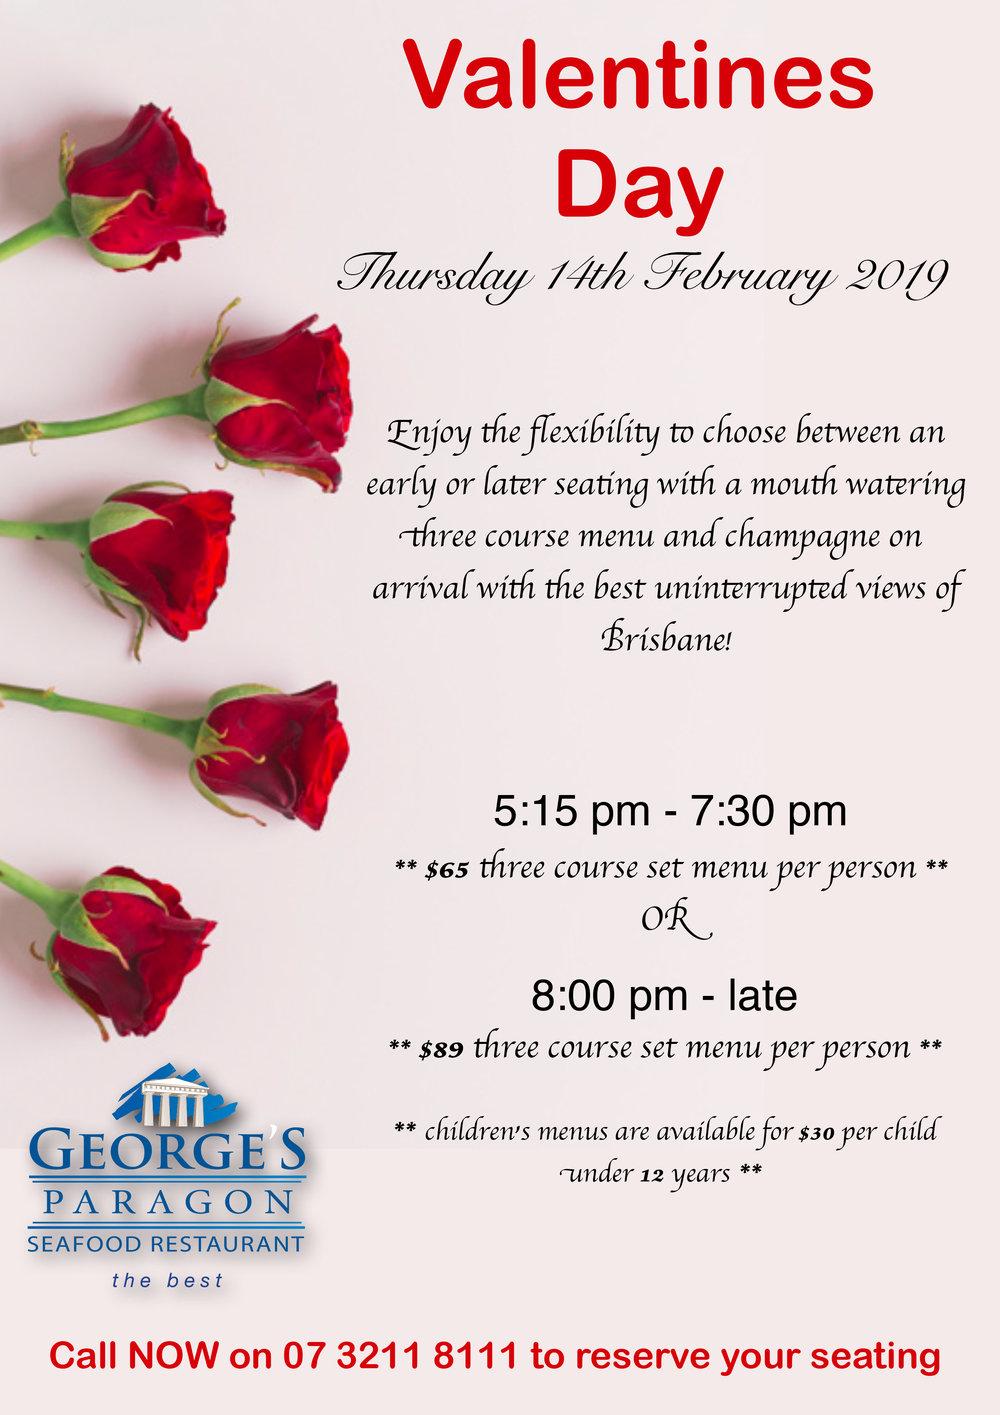 Valentines-Day-2019-2.jpg